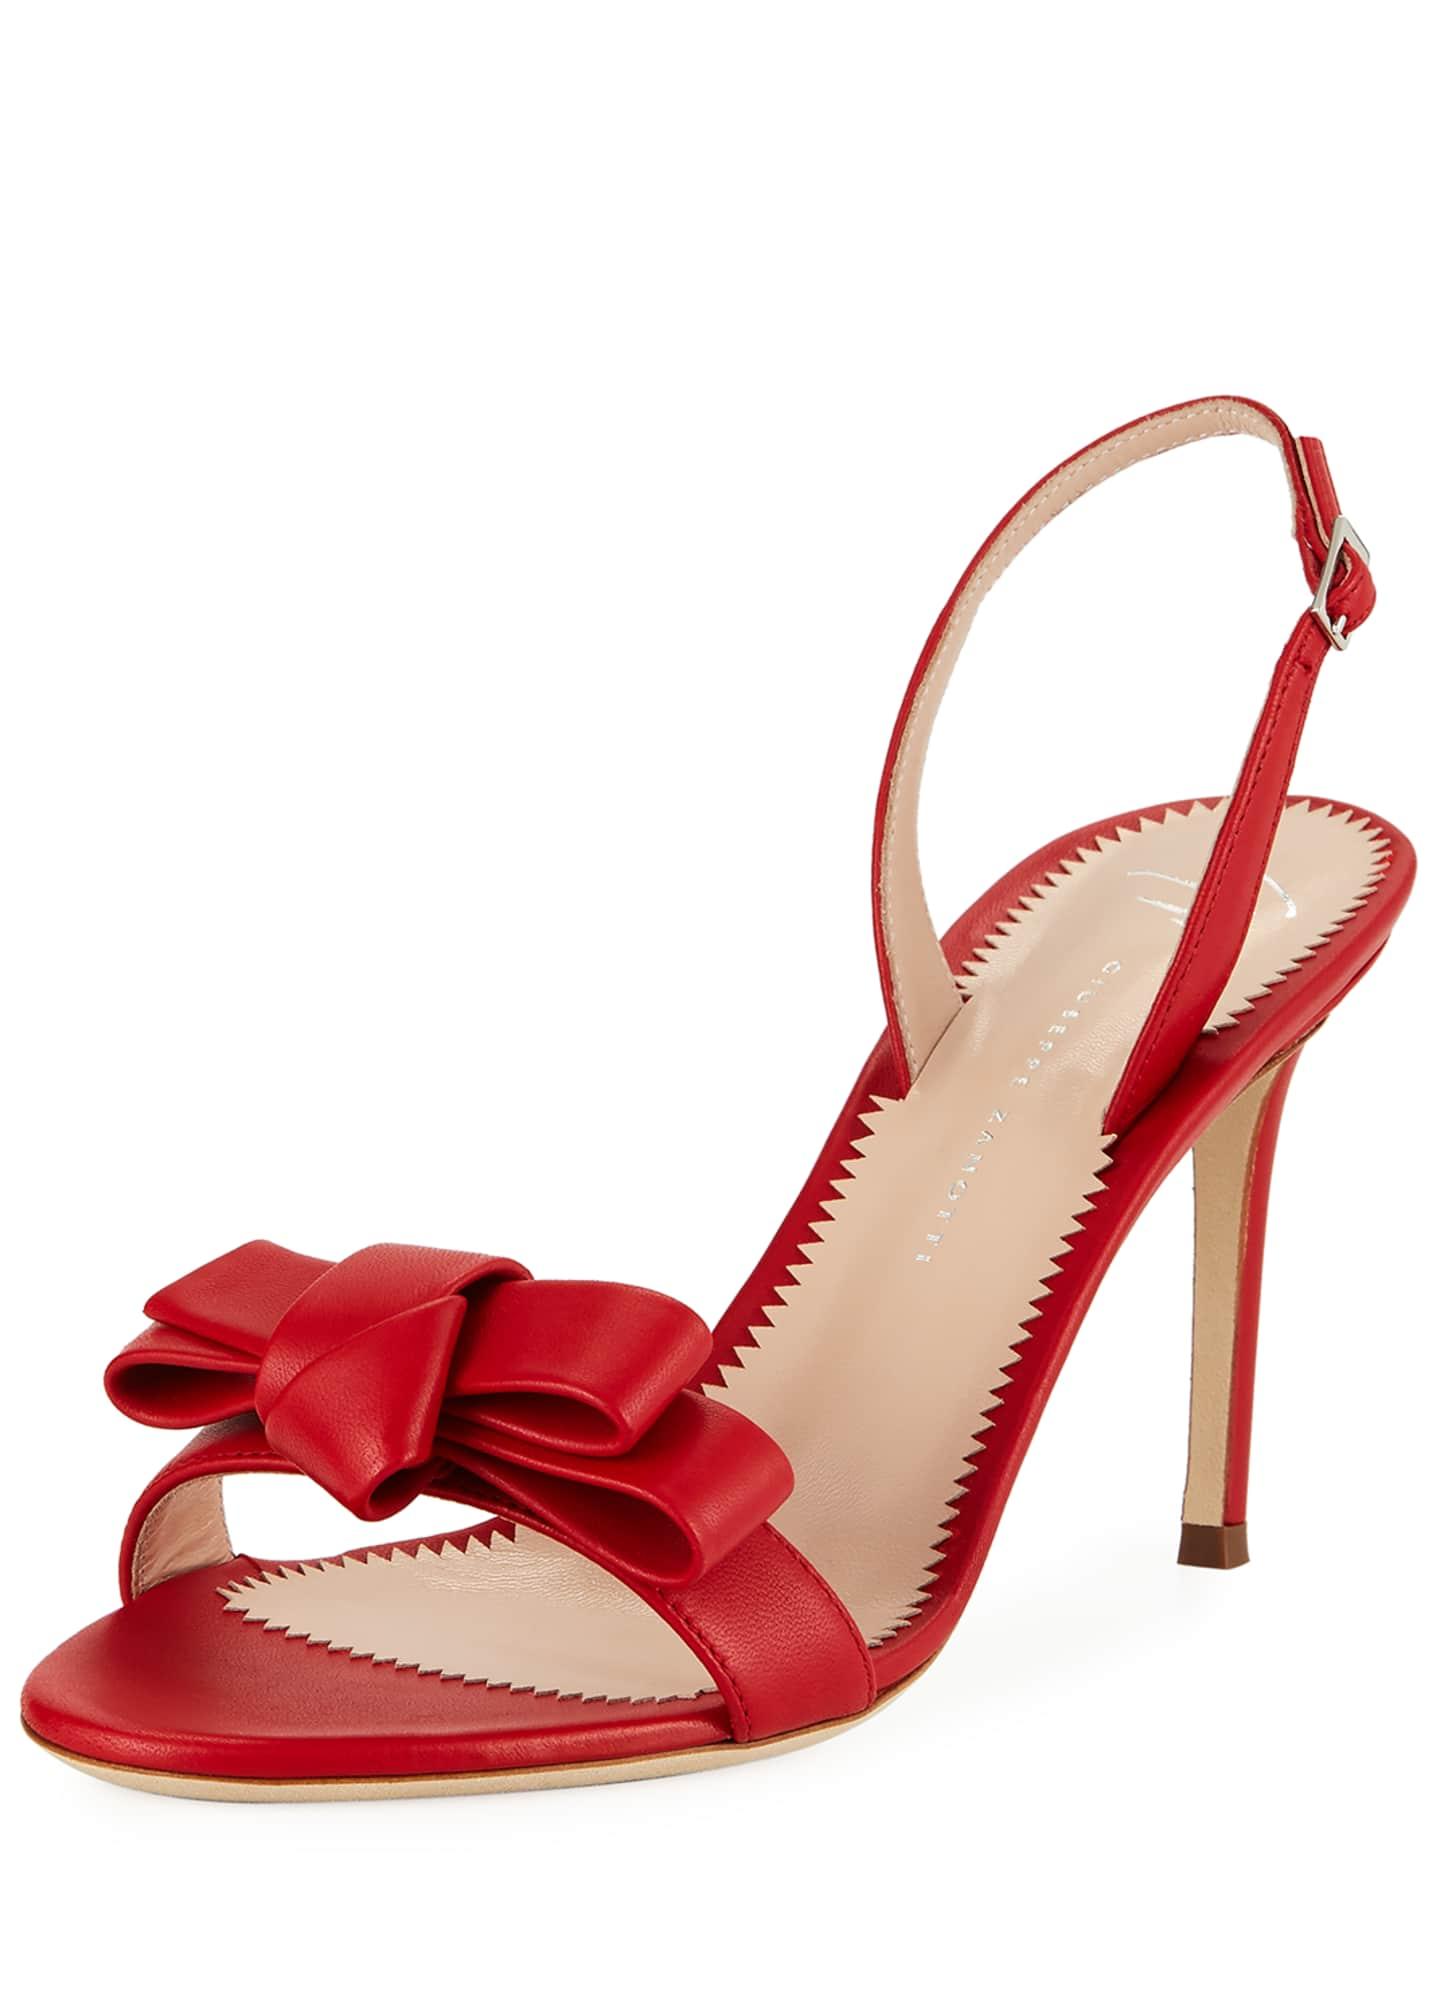 Giuseppe Zanotti Bow Leather Strappy Sandals